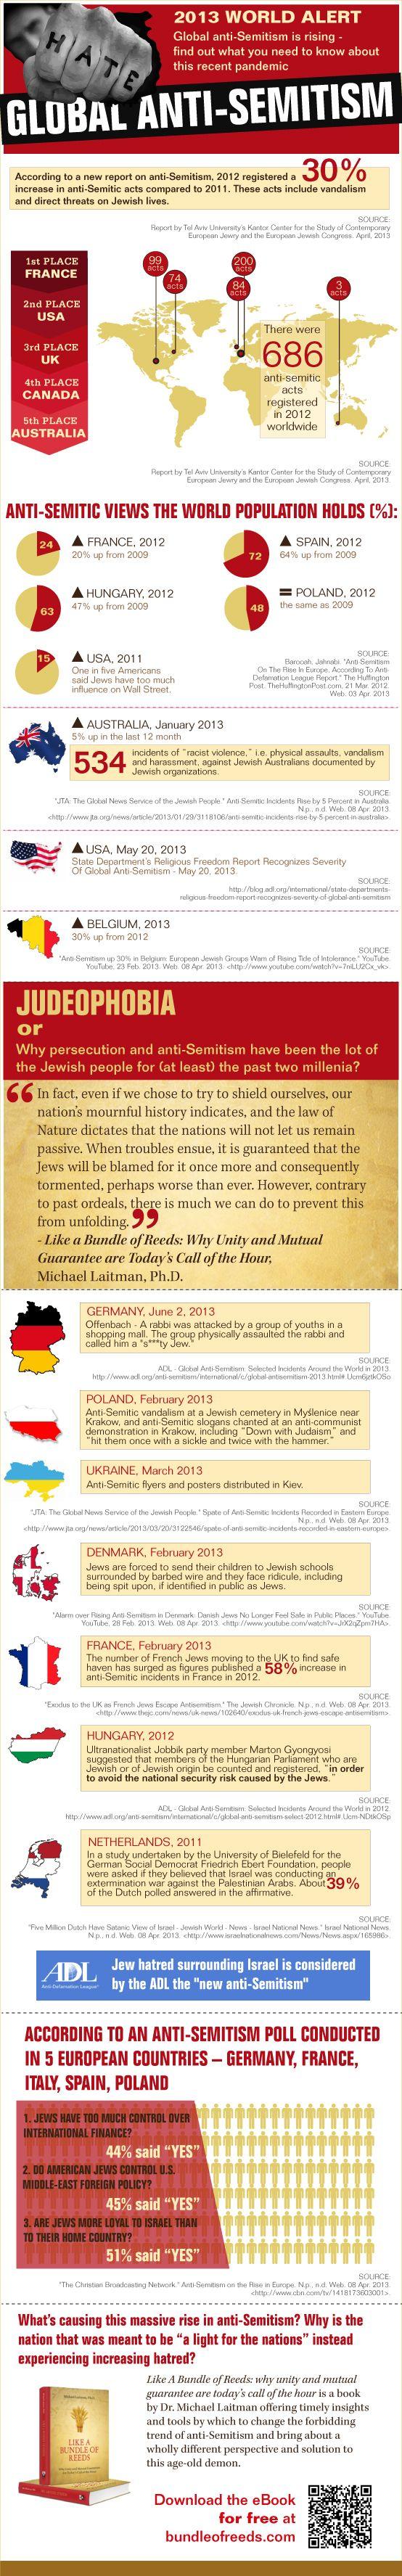 Infographic Antisemitism.